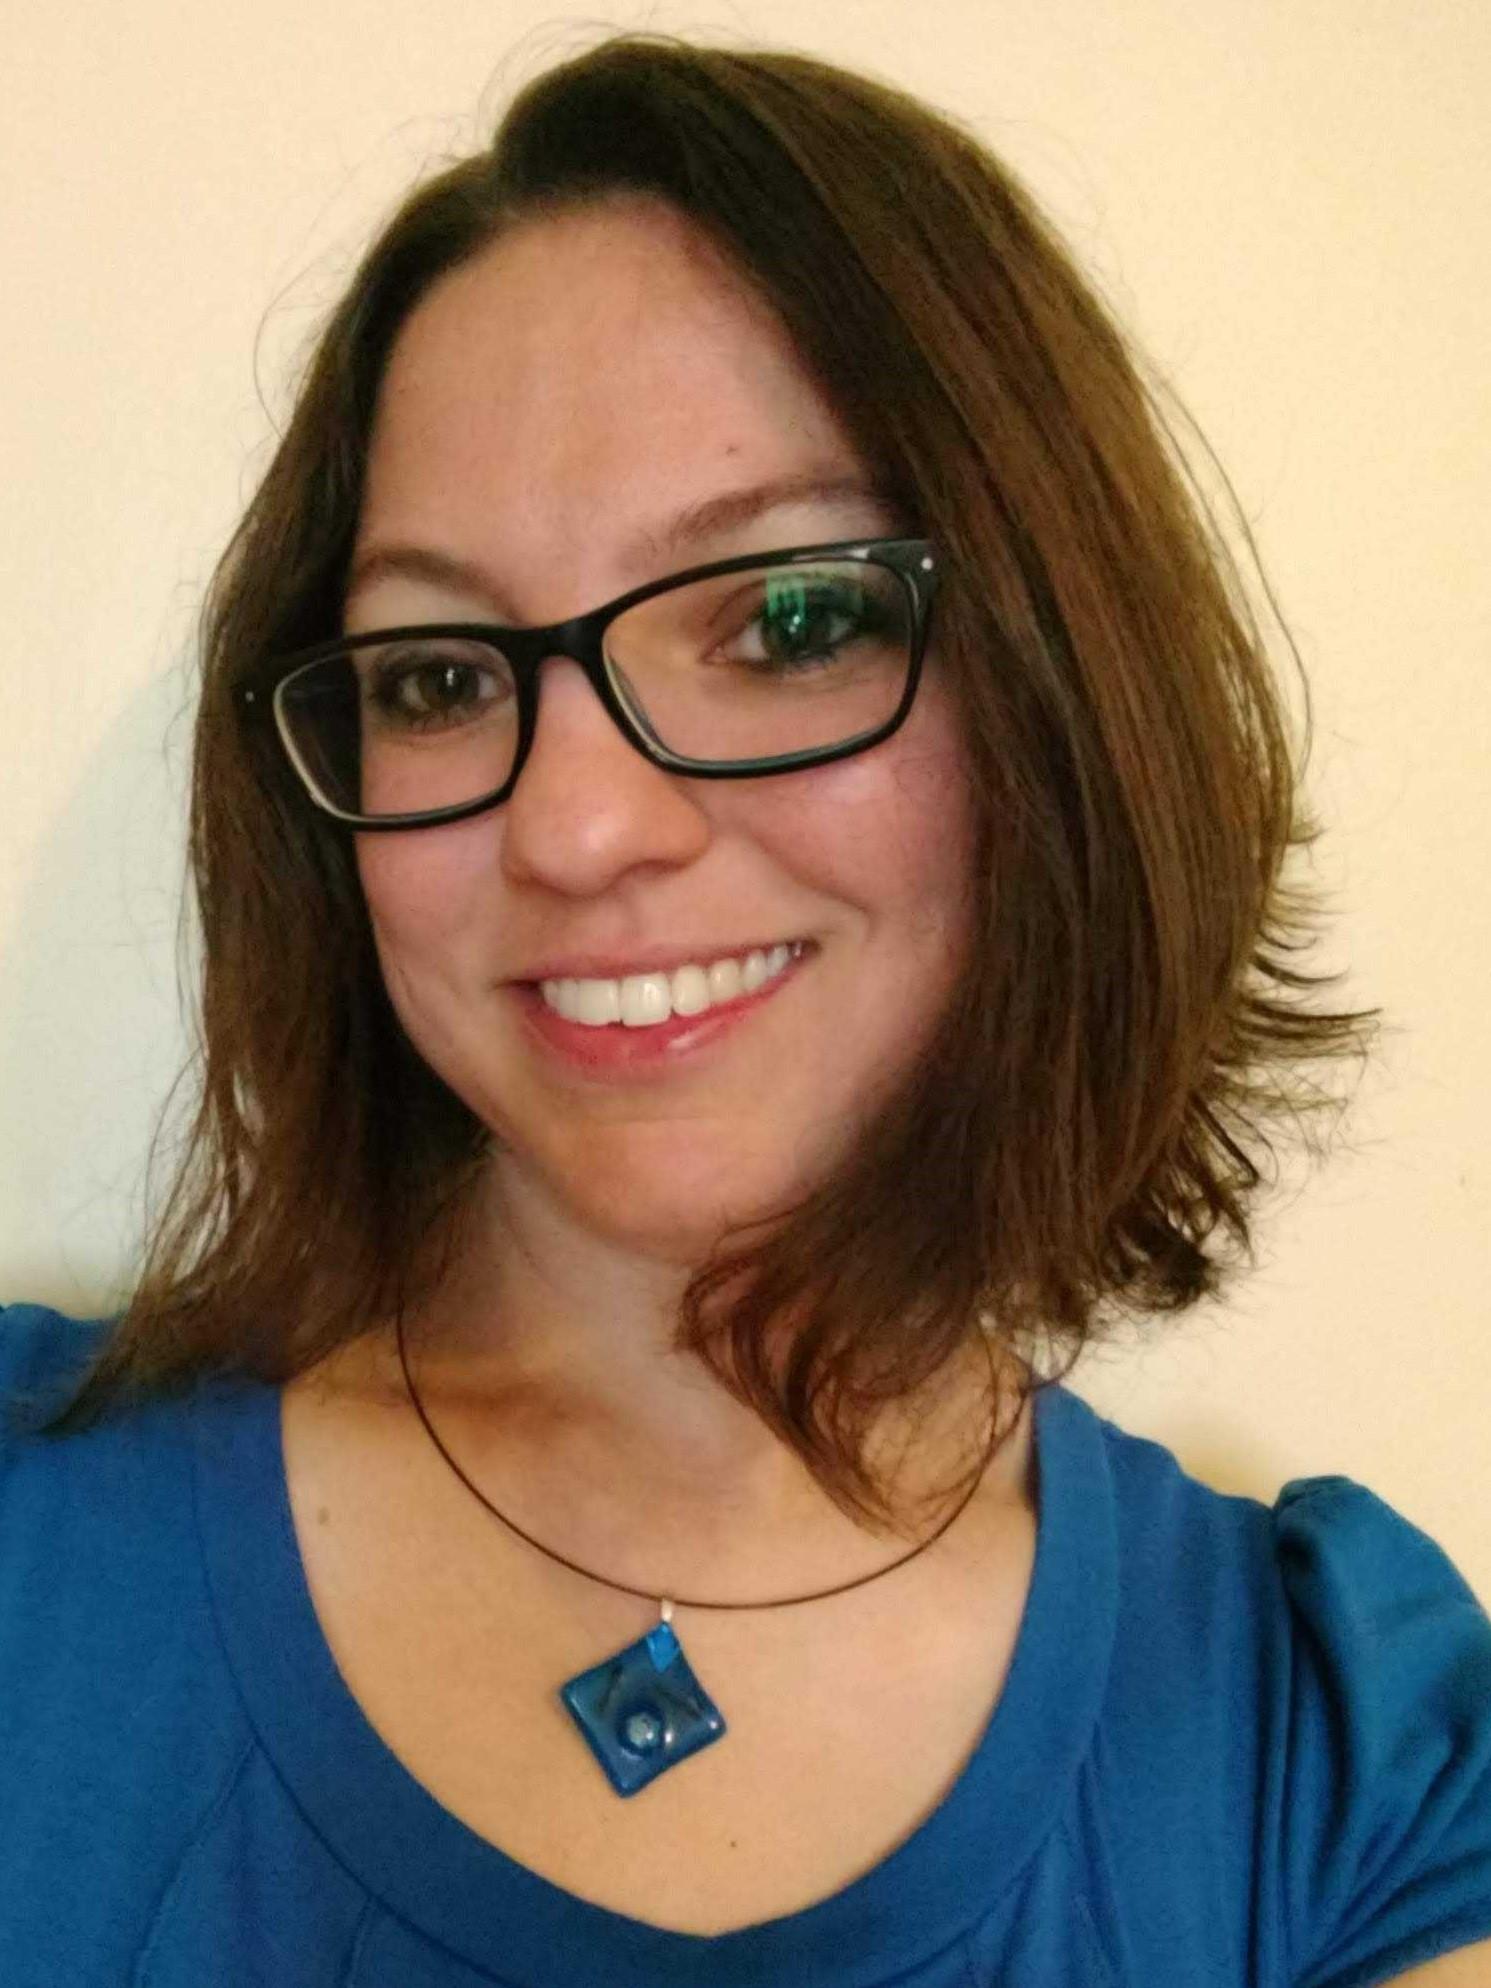 Amy Bustard